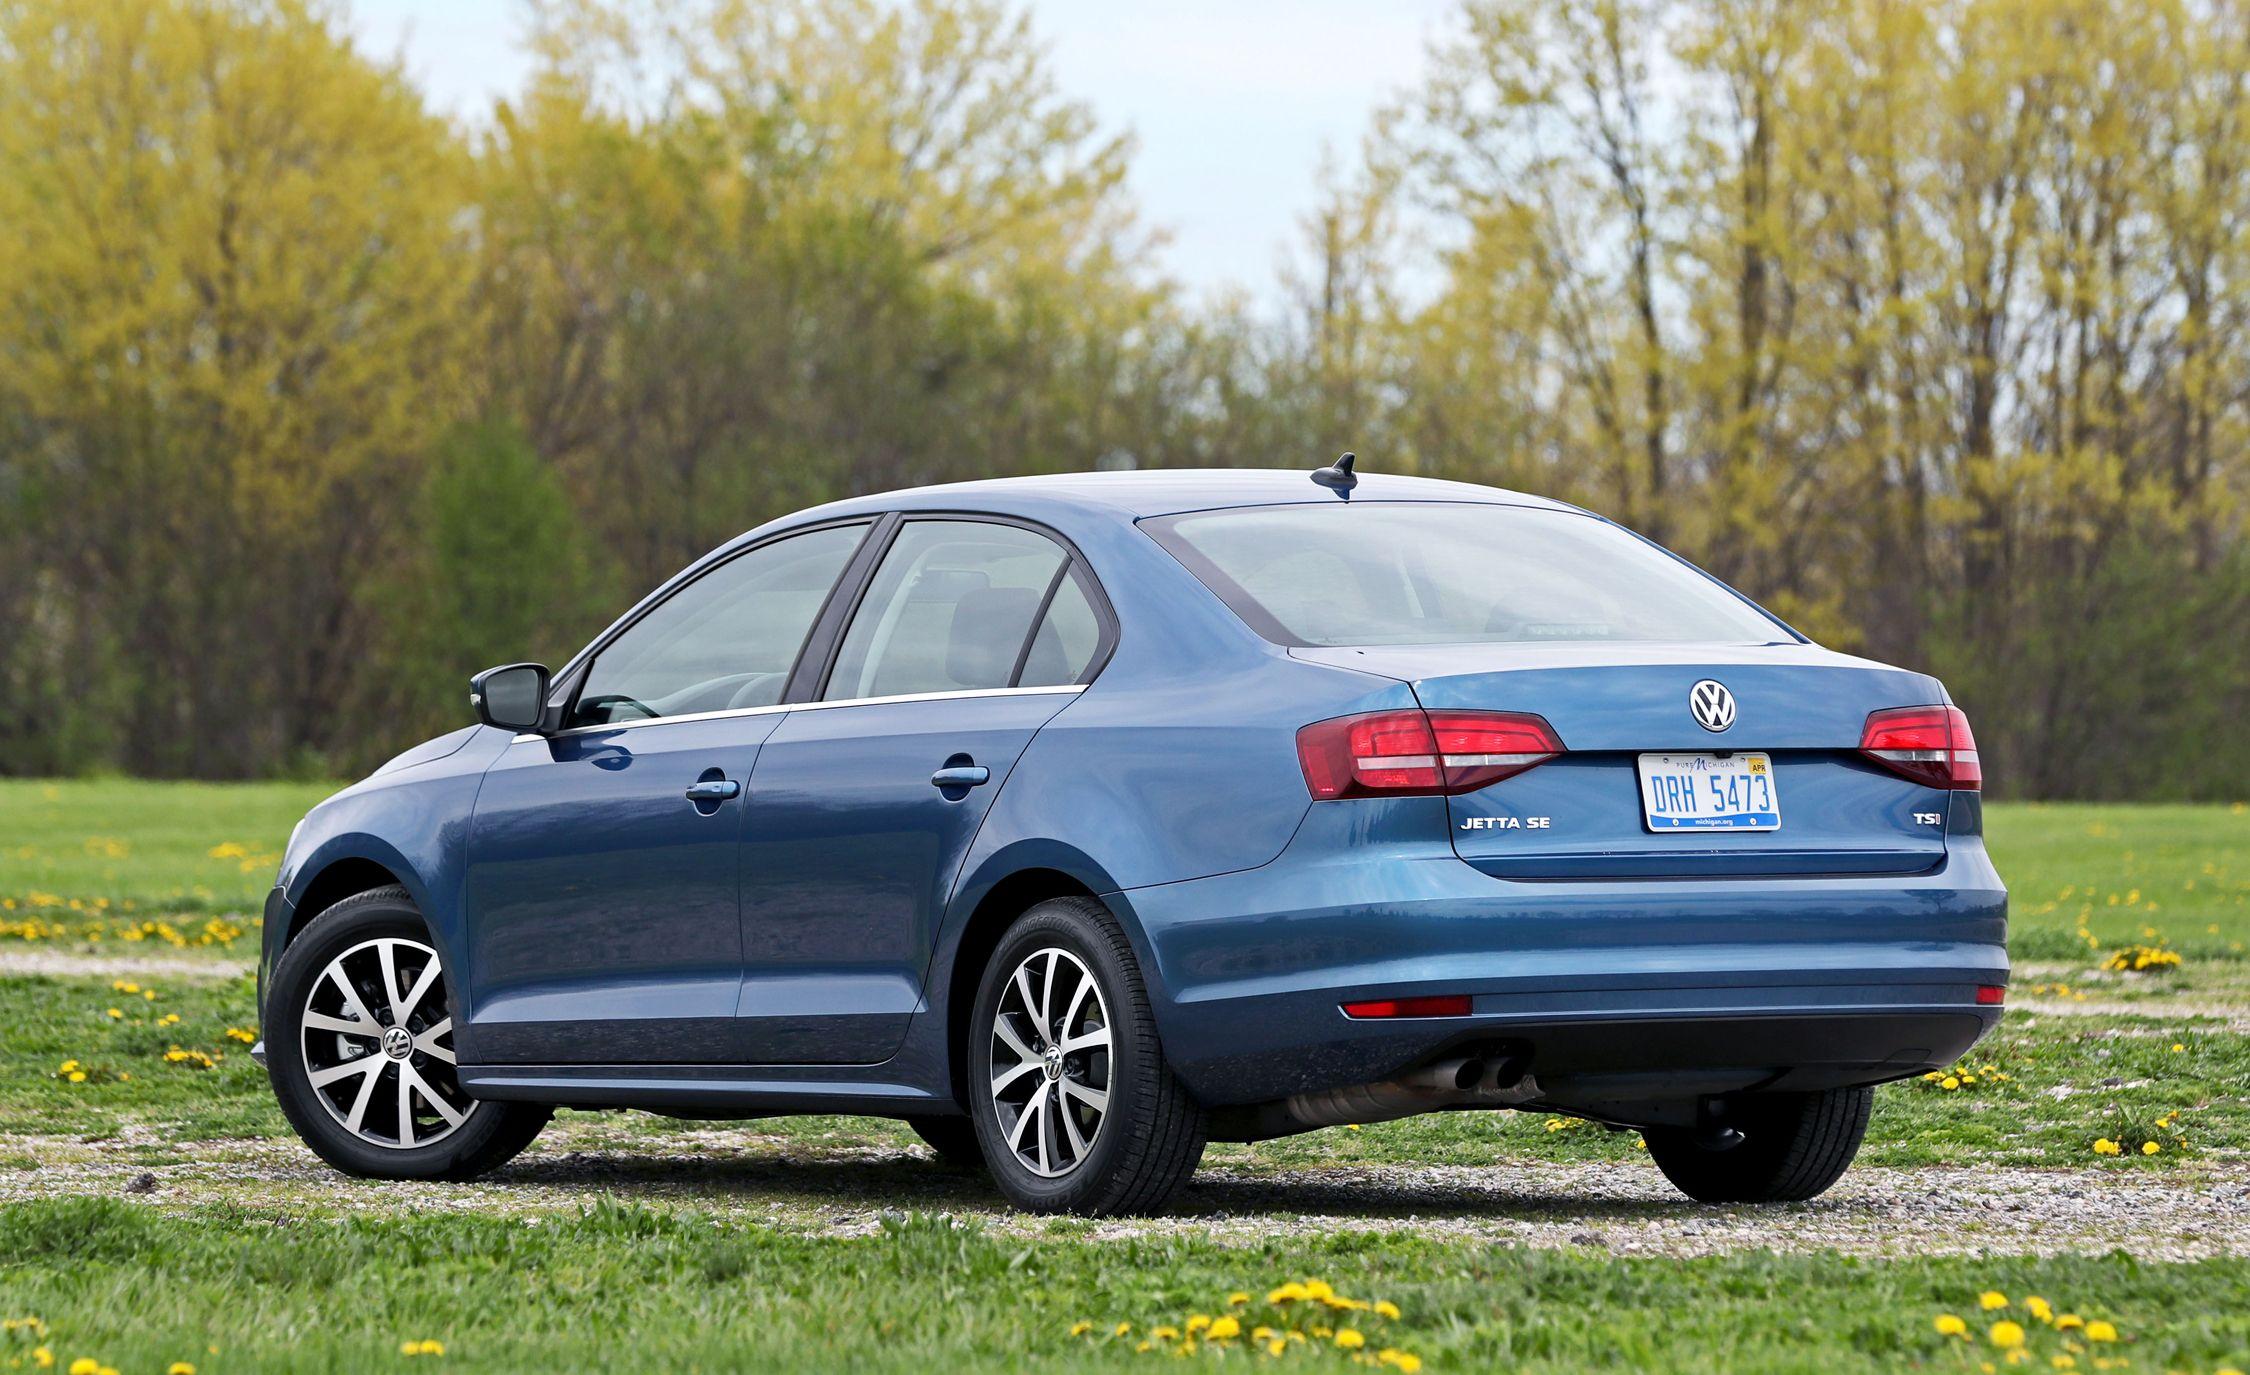 2018 Volkswagen Jetta Cargo Space And Storage Review